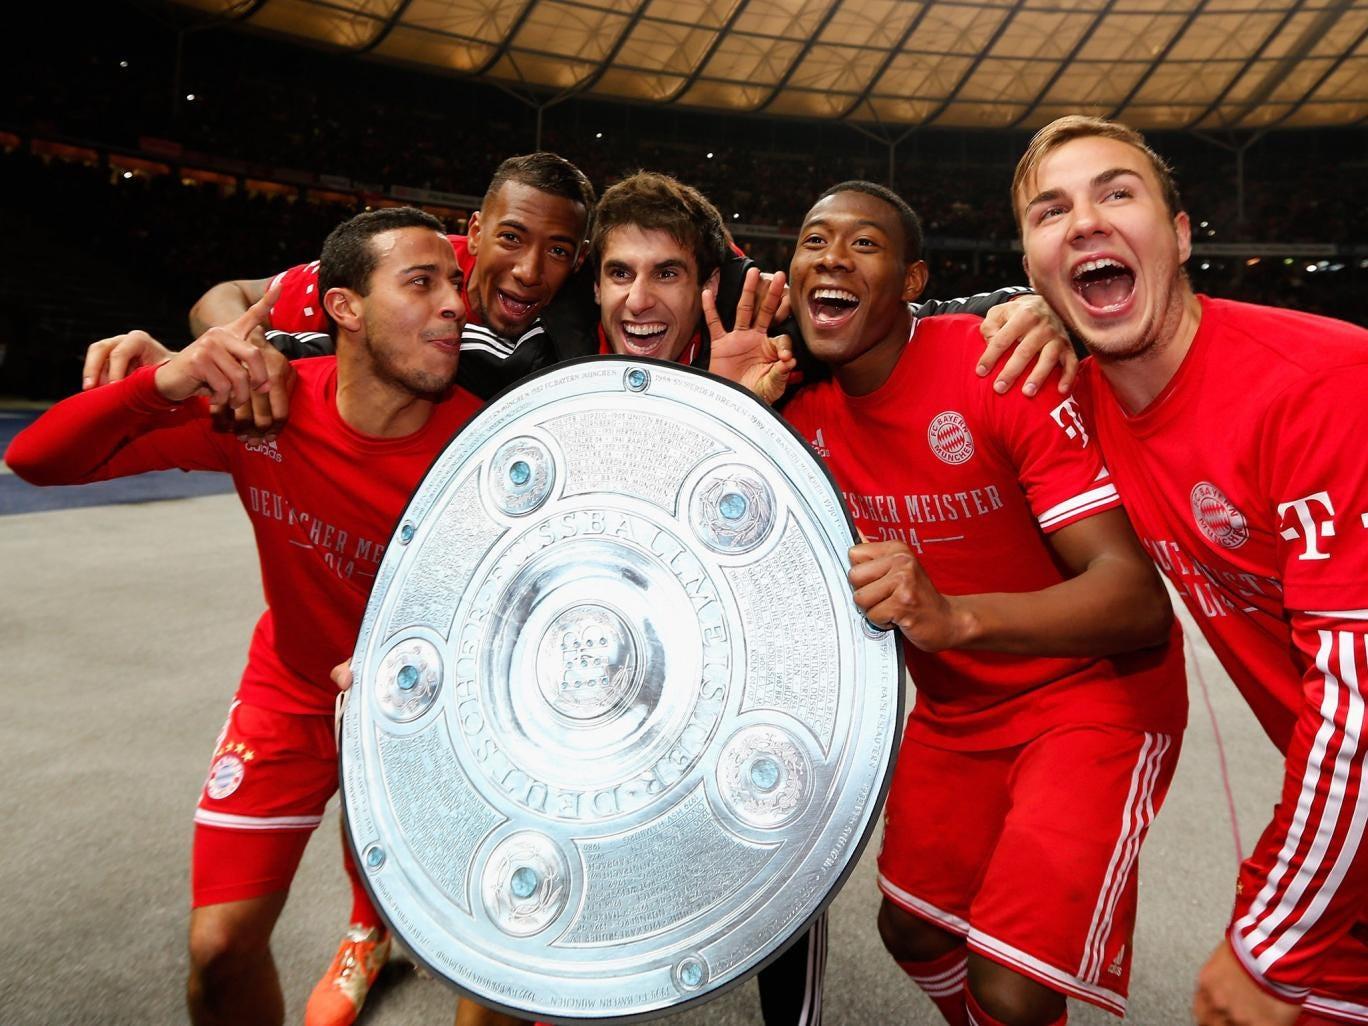 Thiago Alcantara, David Alaba, Javier Martínez Aguinaga and Mario Goetze of Bayern Muenchen celebrate winning the Bundesliga